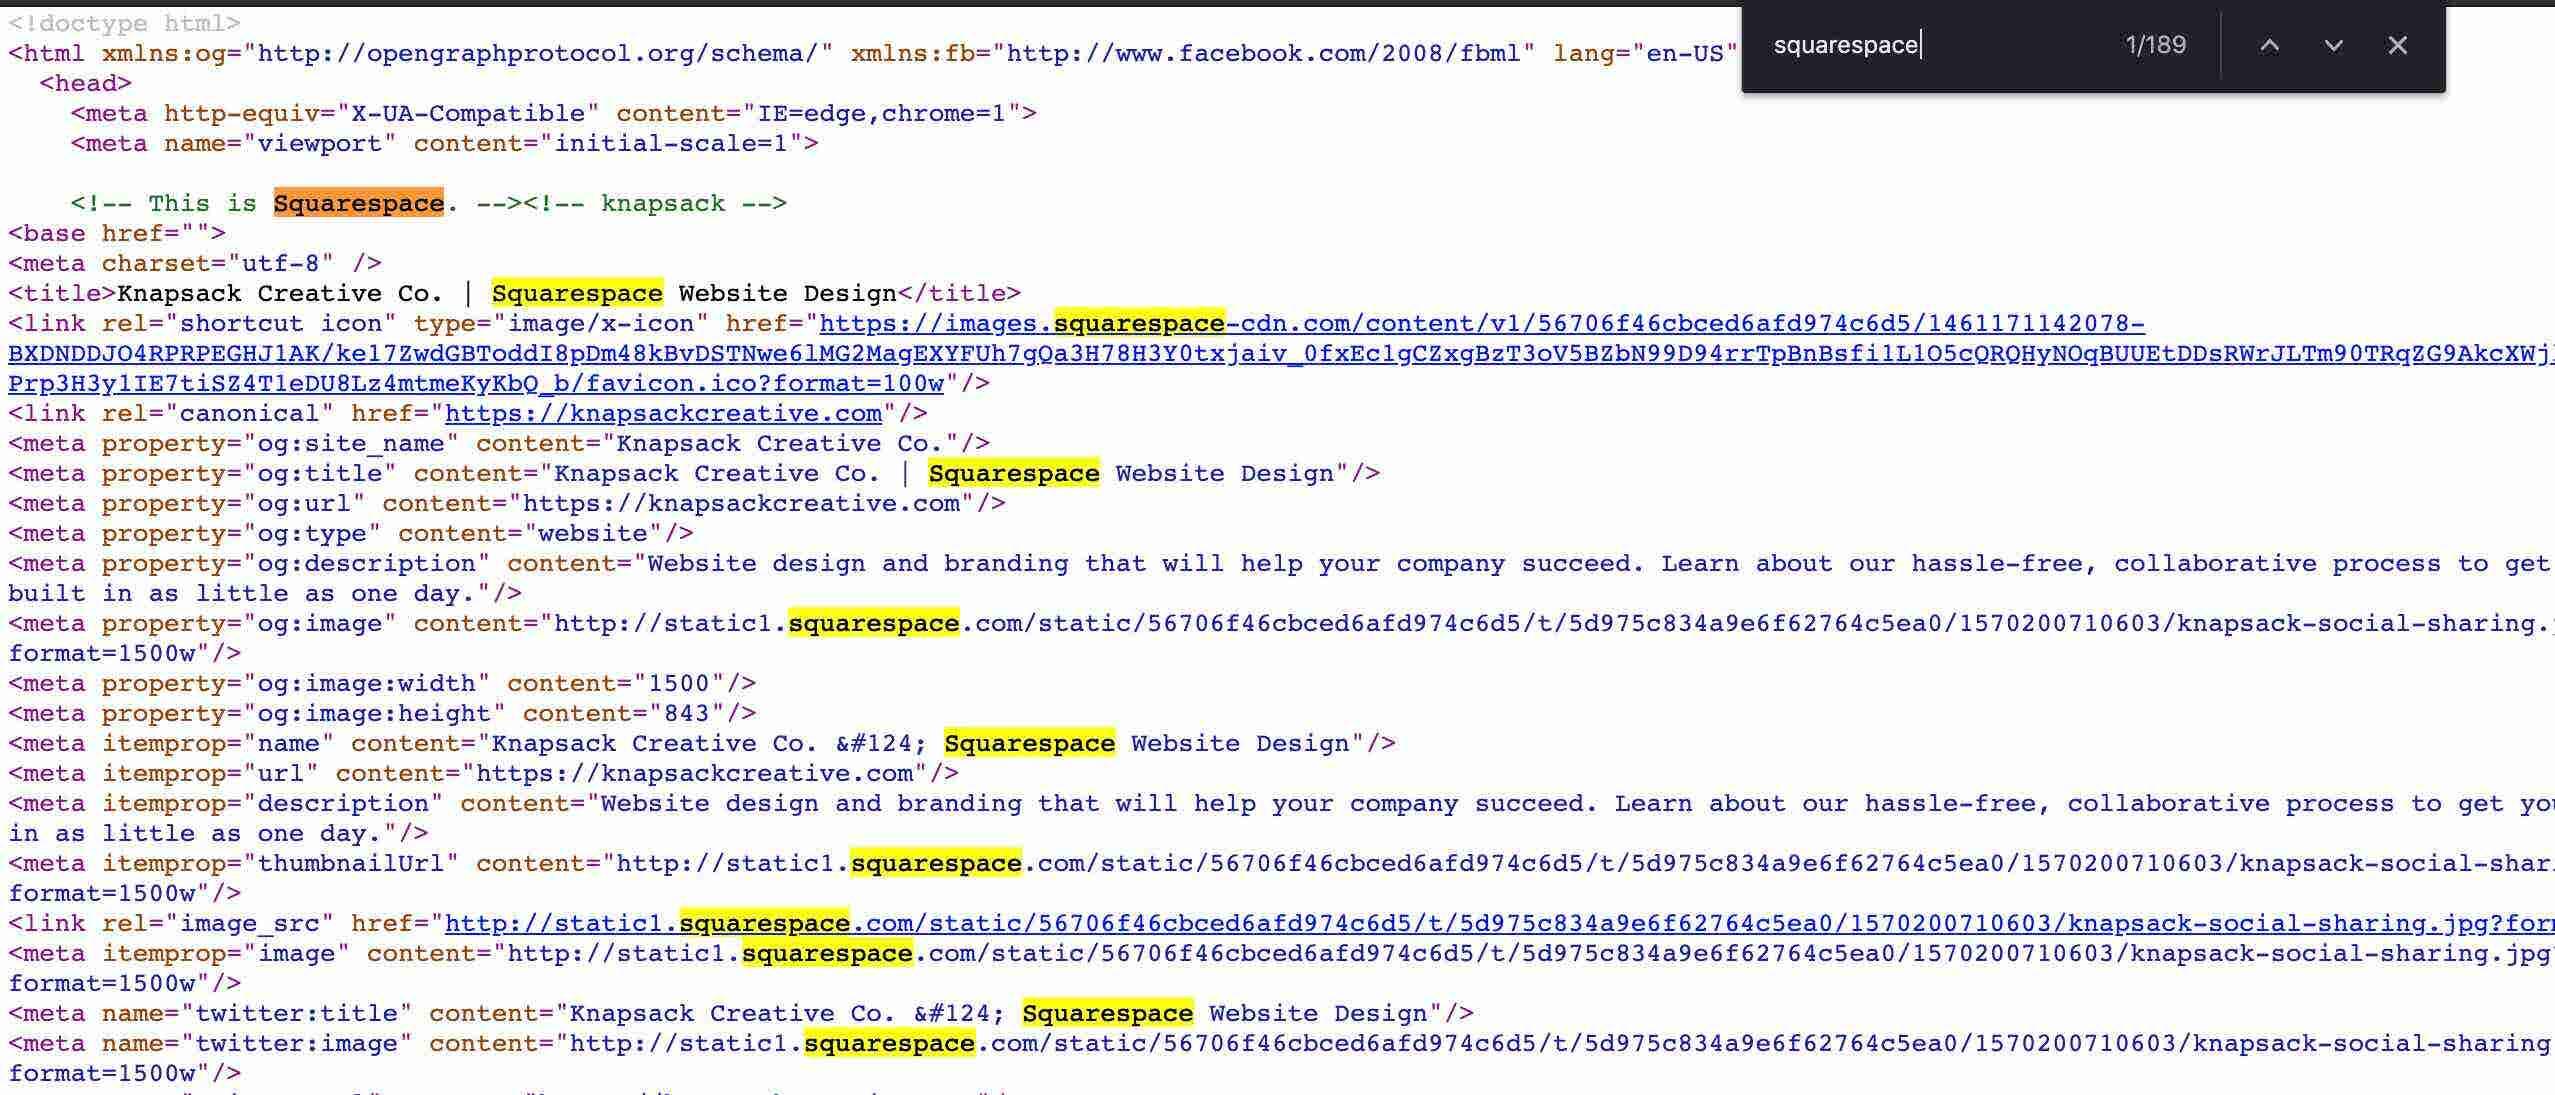 how to check platform website built on